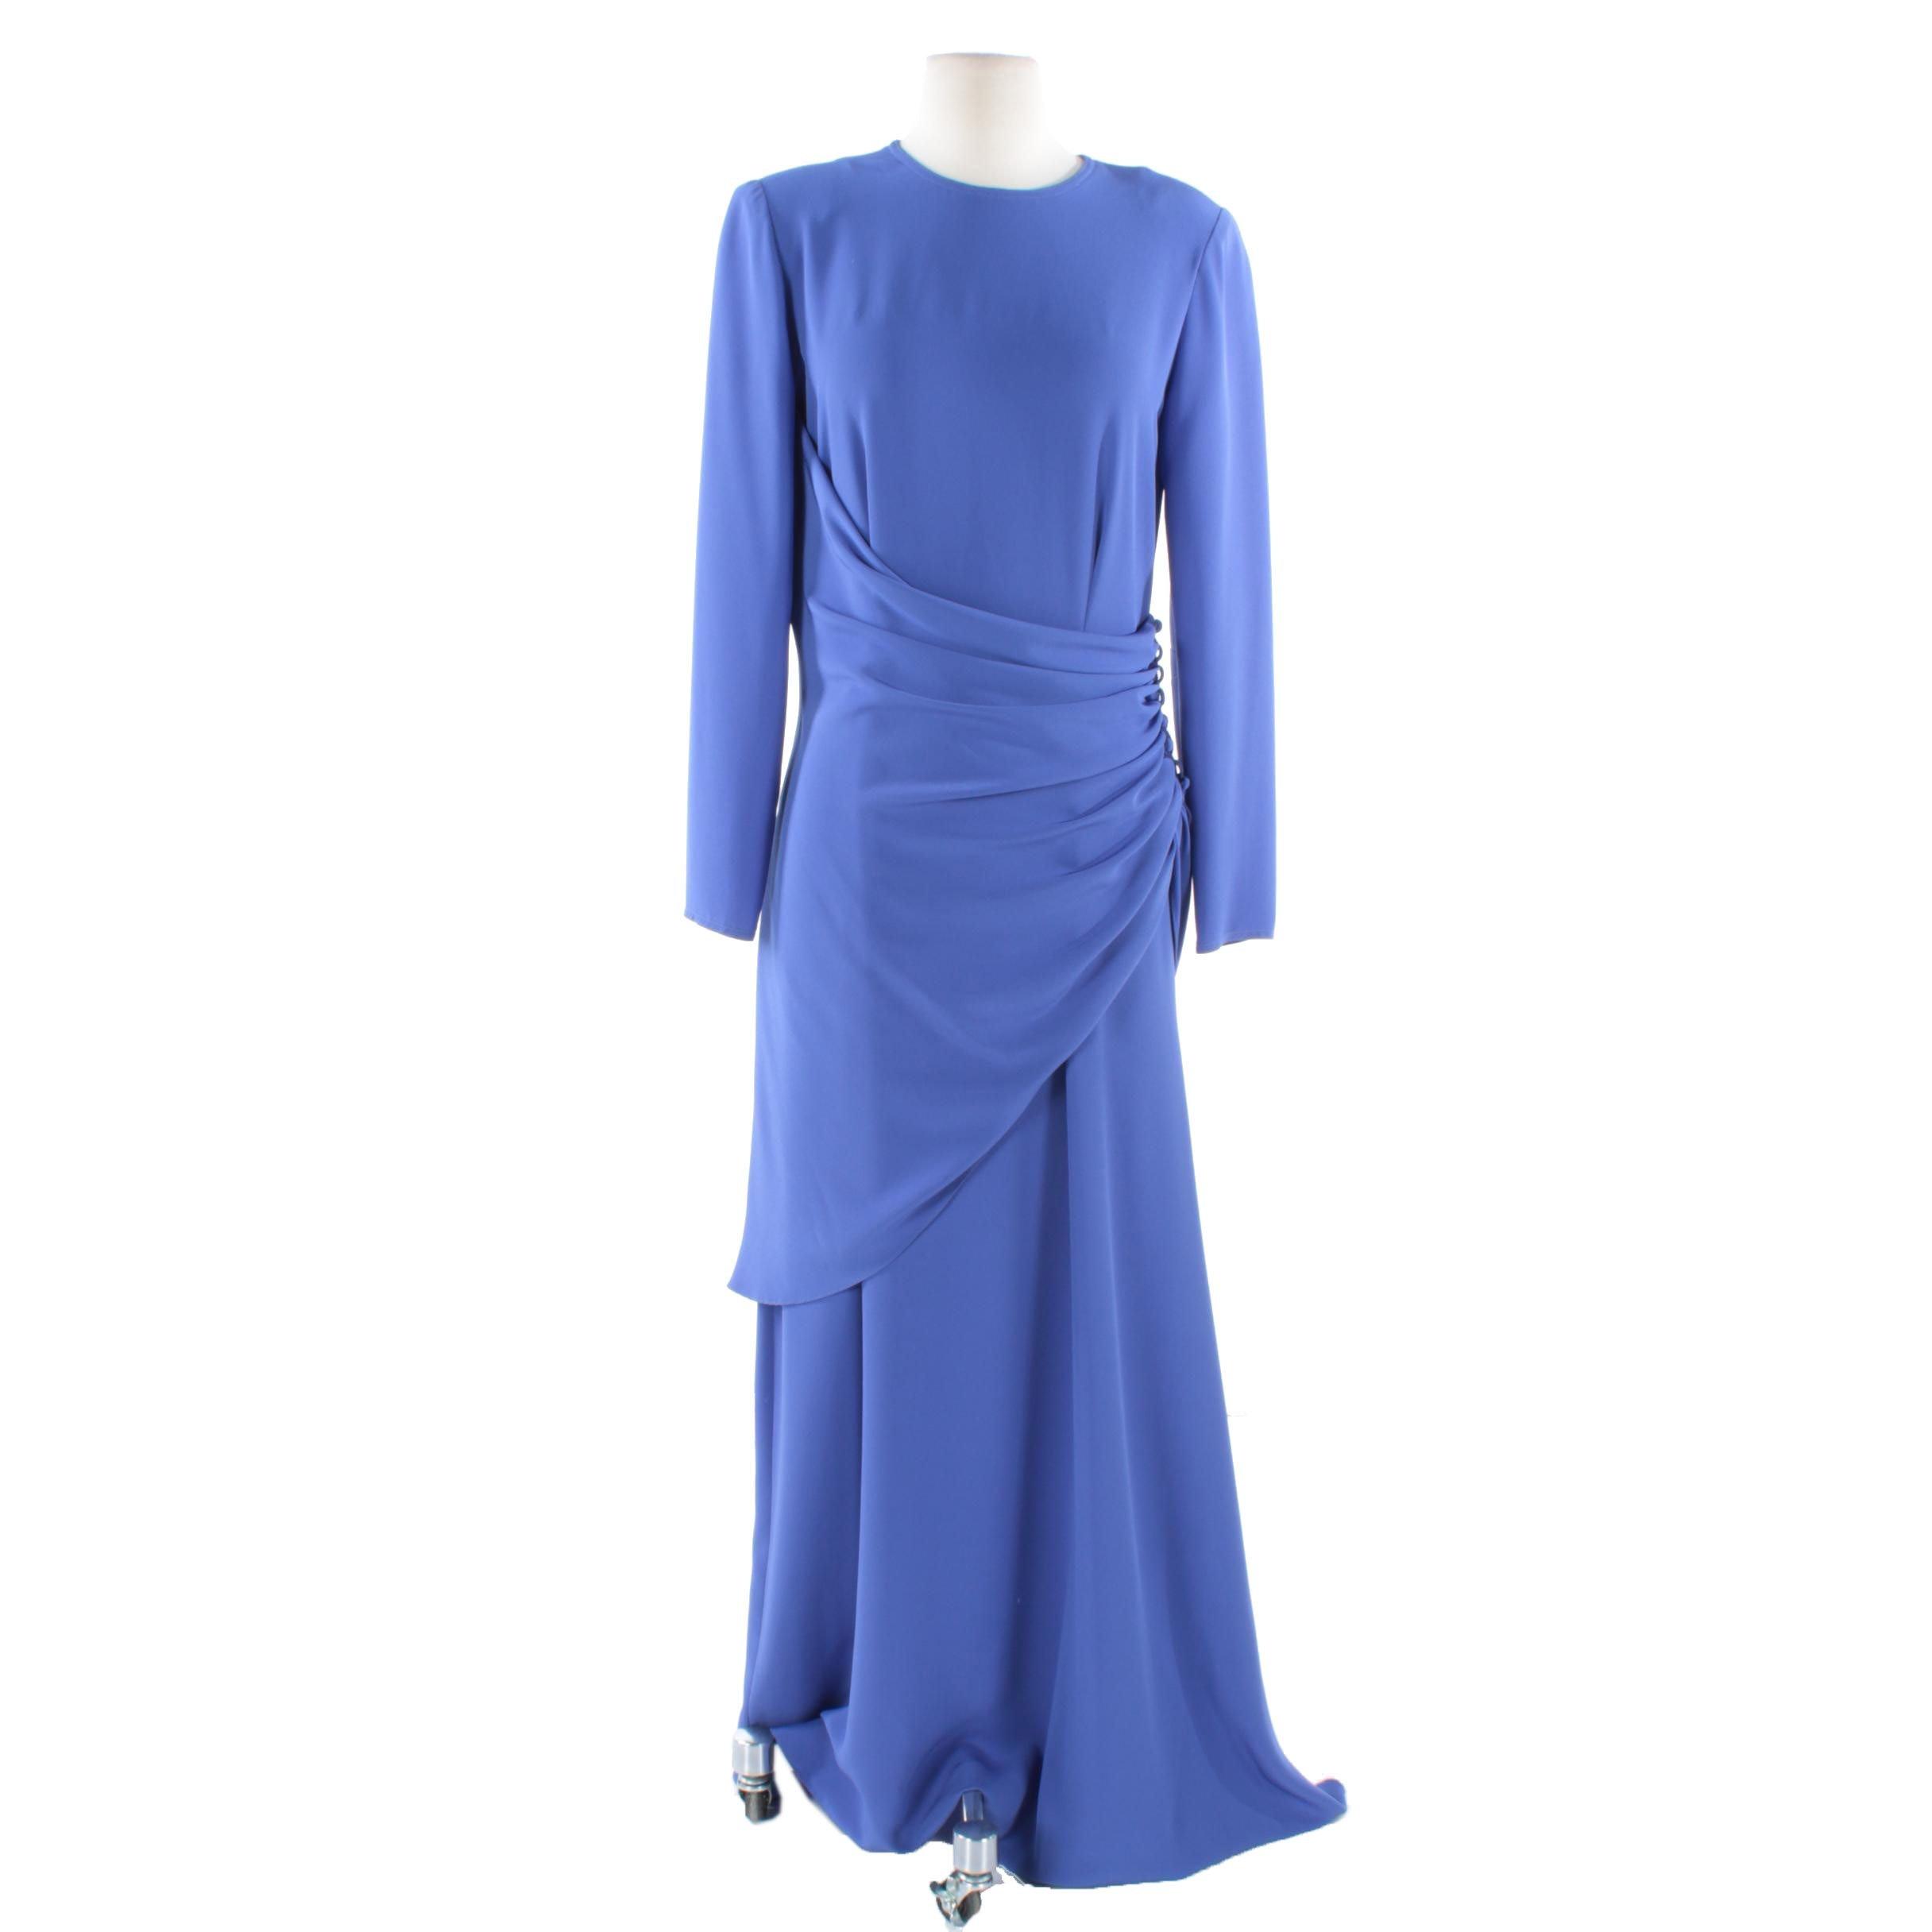 Miss Elliette Dress